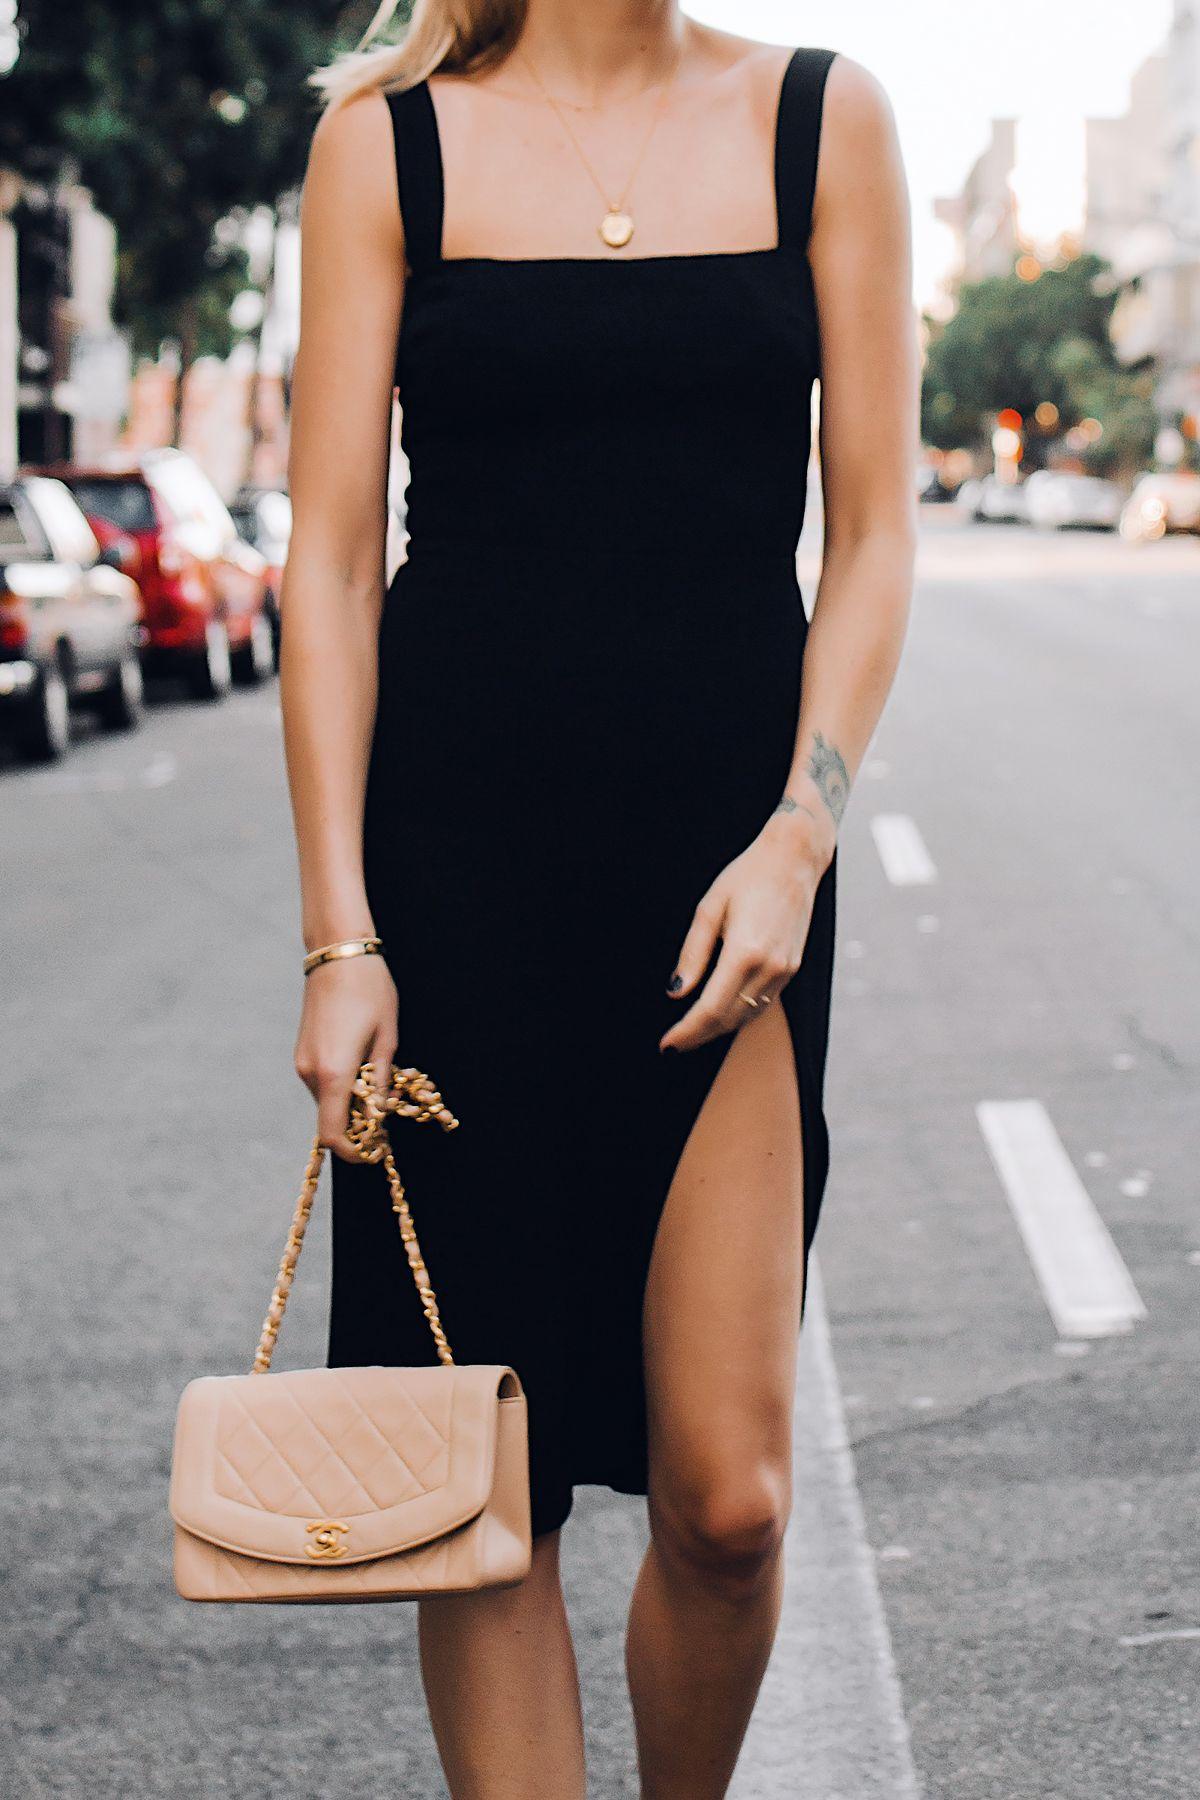 Woman Wearing Reformation Black Dress Chanel Tan Diana Handbag Gold Coin Necklace Fashion Jackson Dresses To Wear To A Wedding Black Dresses Classy Black Dress [ 1800 x 1200 Pixel ]